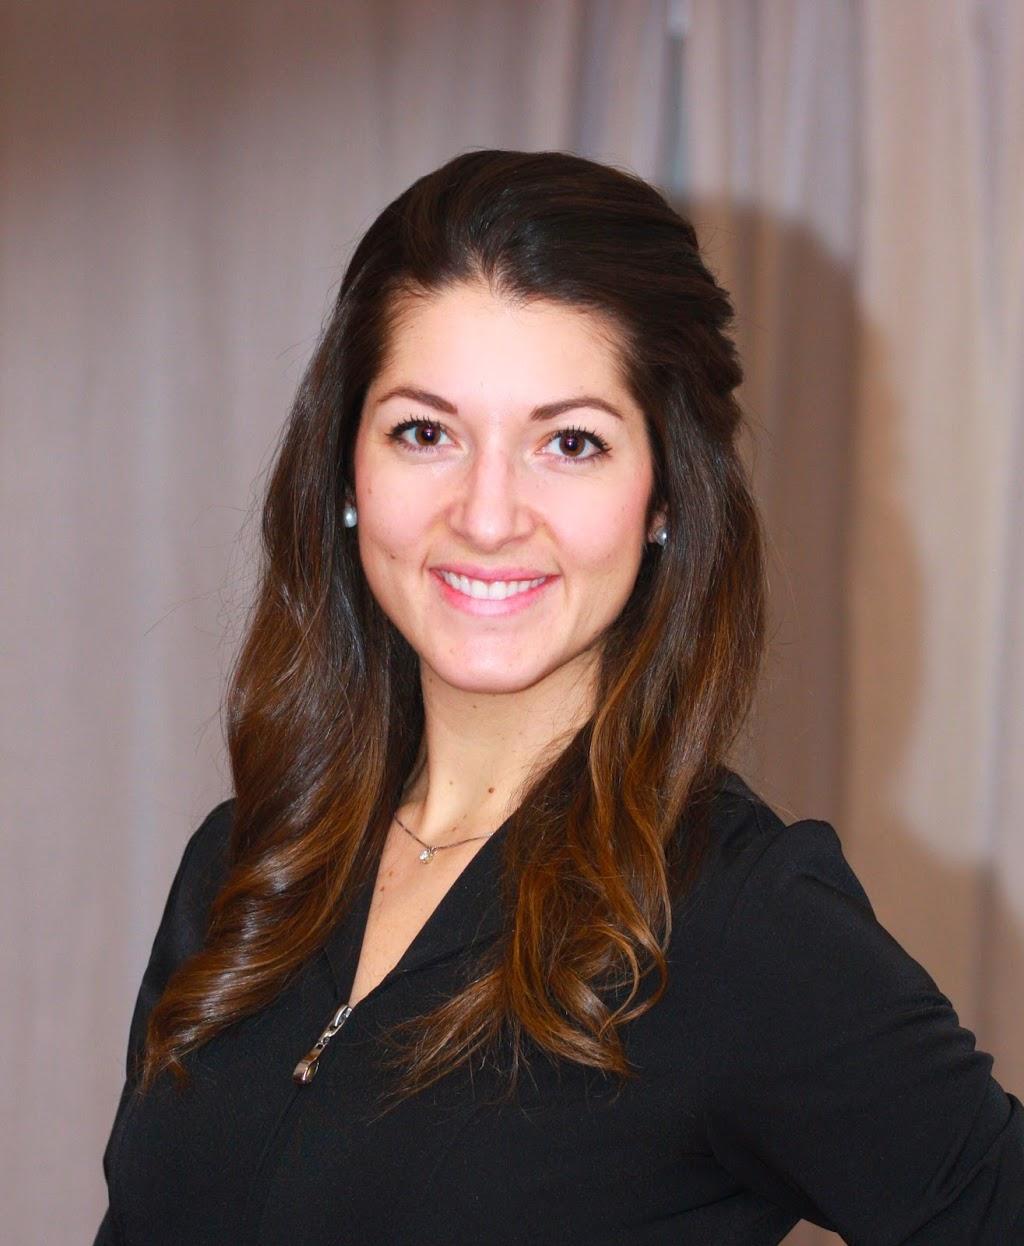 Lucie Viens, Dentiste | dentist | 1185 Rue Notre-Dame, Lavaltrie, QC J5T 1R6, Canada | 4505865006 OR +1 450-586-5006